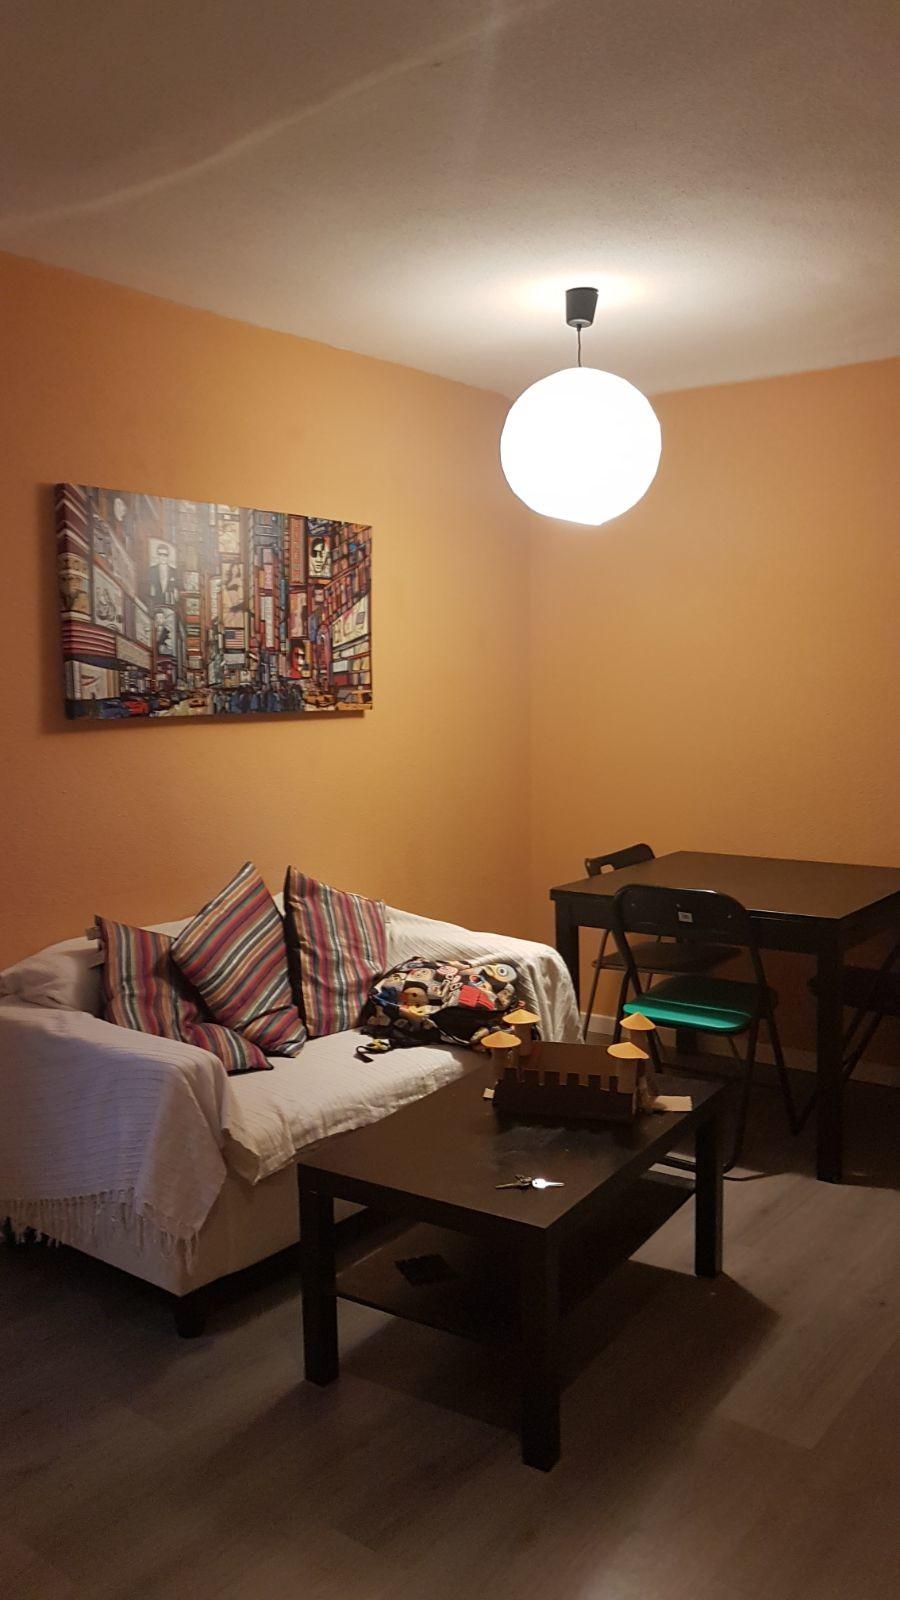 apartamento-2-habitaciones-x-corte-ingles-de-goya-madrid-5b502b83aab600043fa389b8b140f7f7